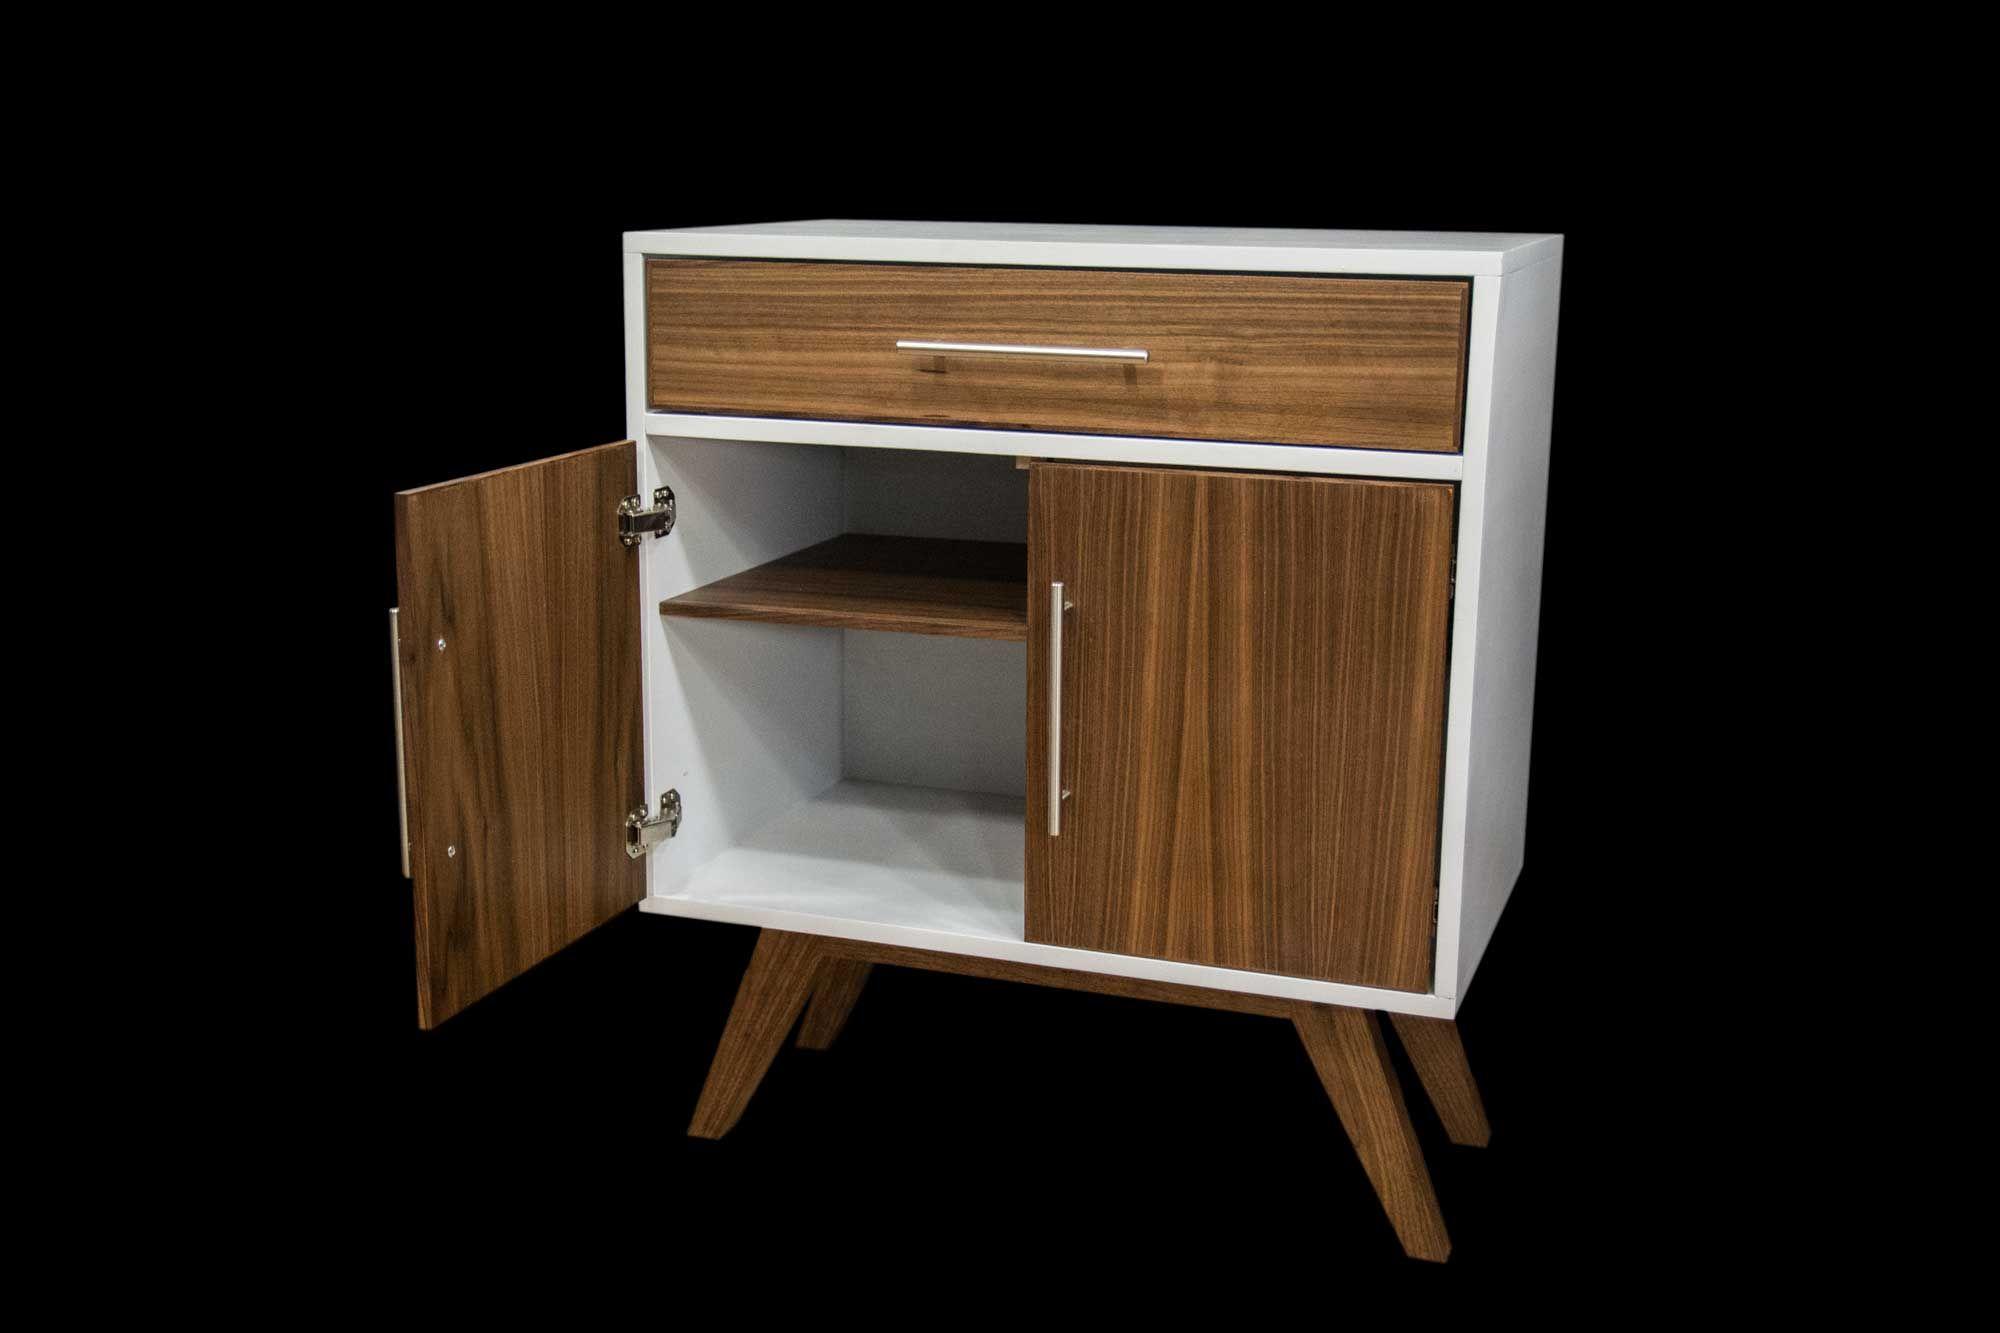 Modern Cabinet mid century modern coffee cabinet | craftiness - building